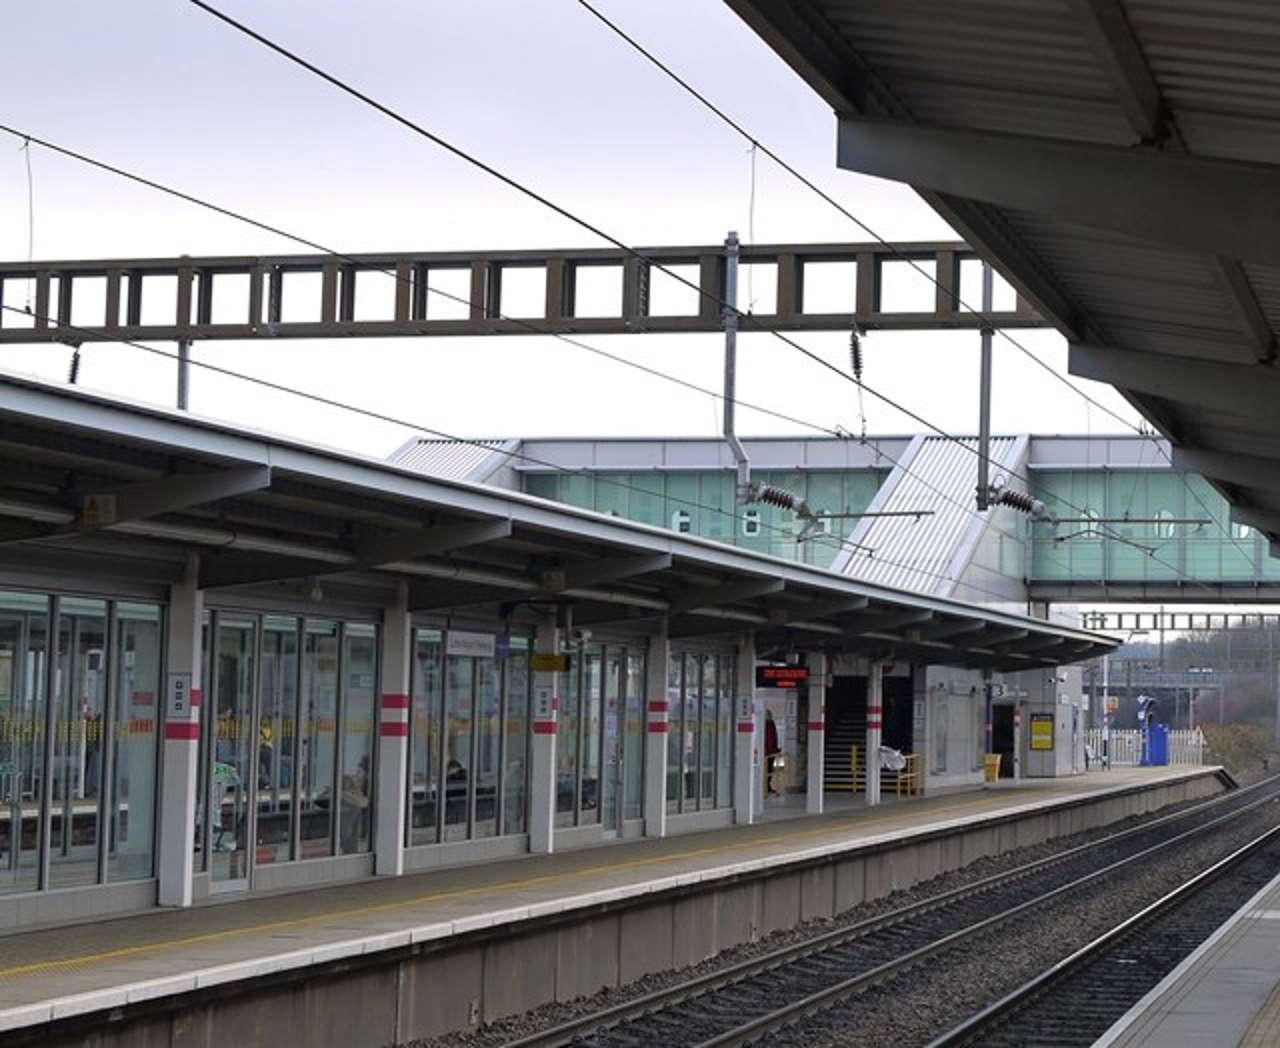 Network Rail begins vital lift improvement work at Luton Airport Parkway station